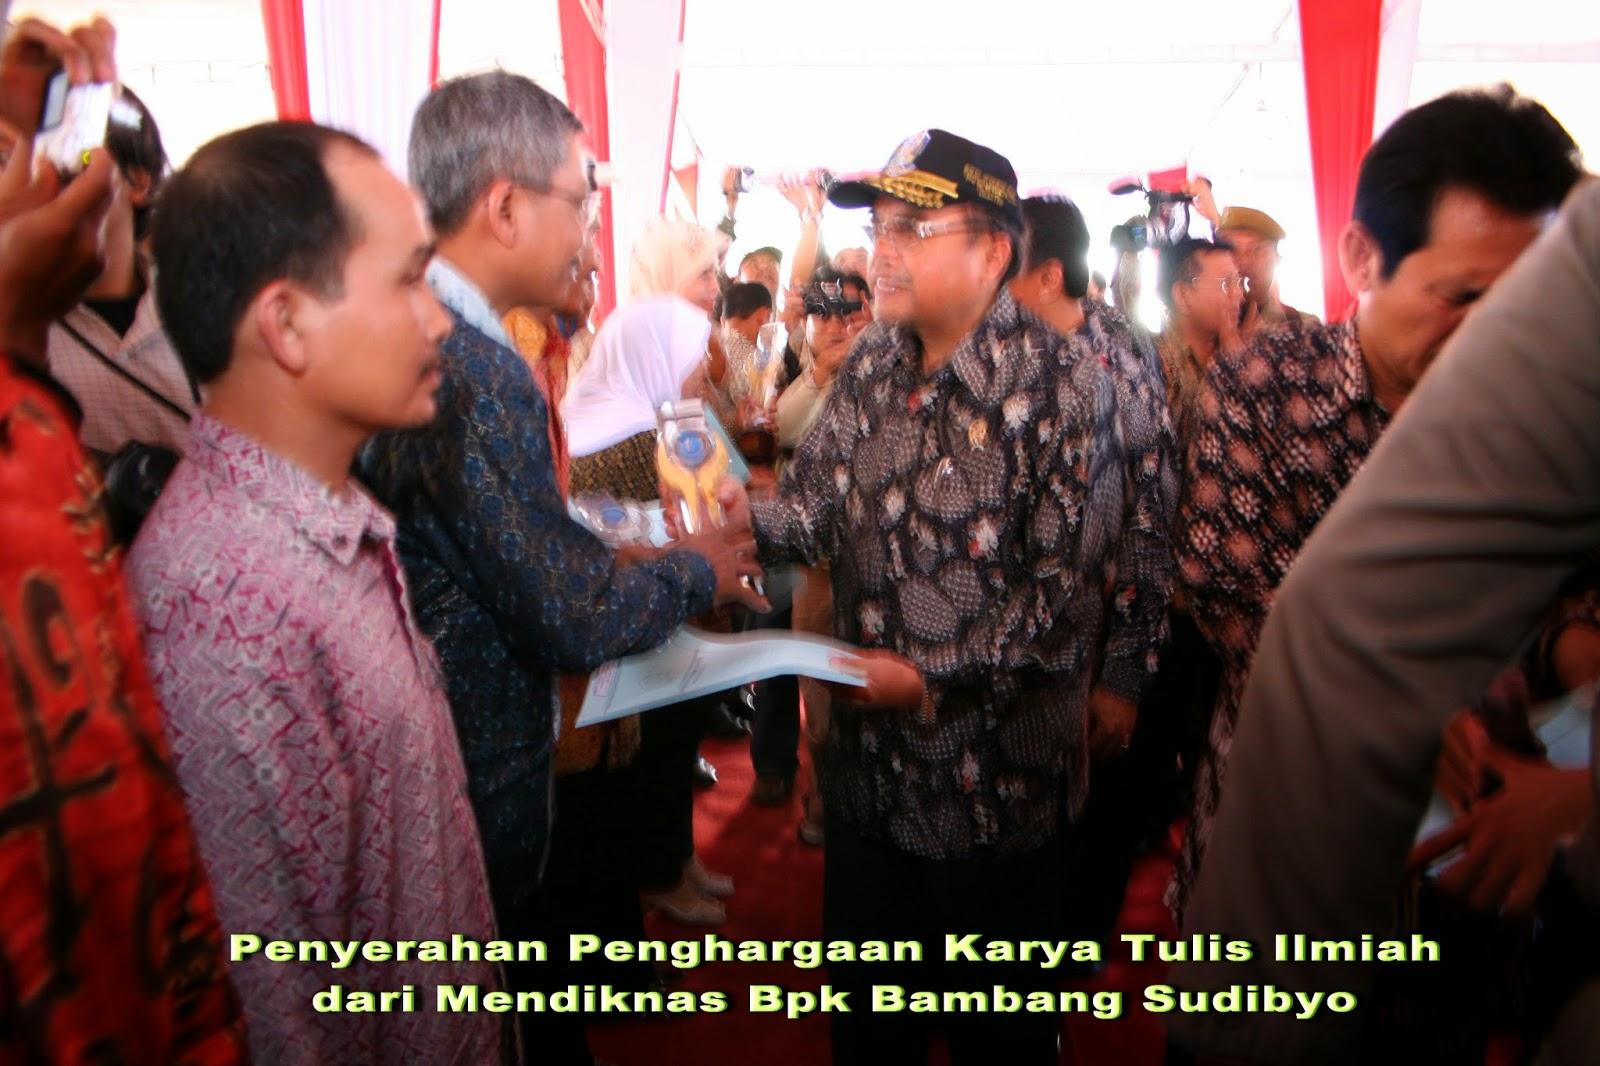 Tulisan Kalbu Nostalgia Bersama Bpk Menteri Dan Teman Teman 2006 Probolinggo Jawa Timur